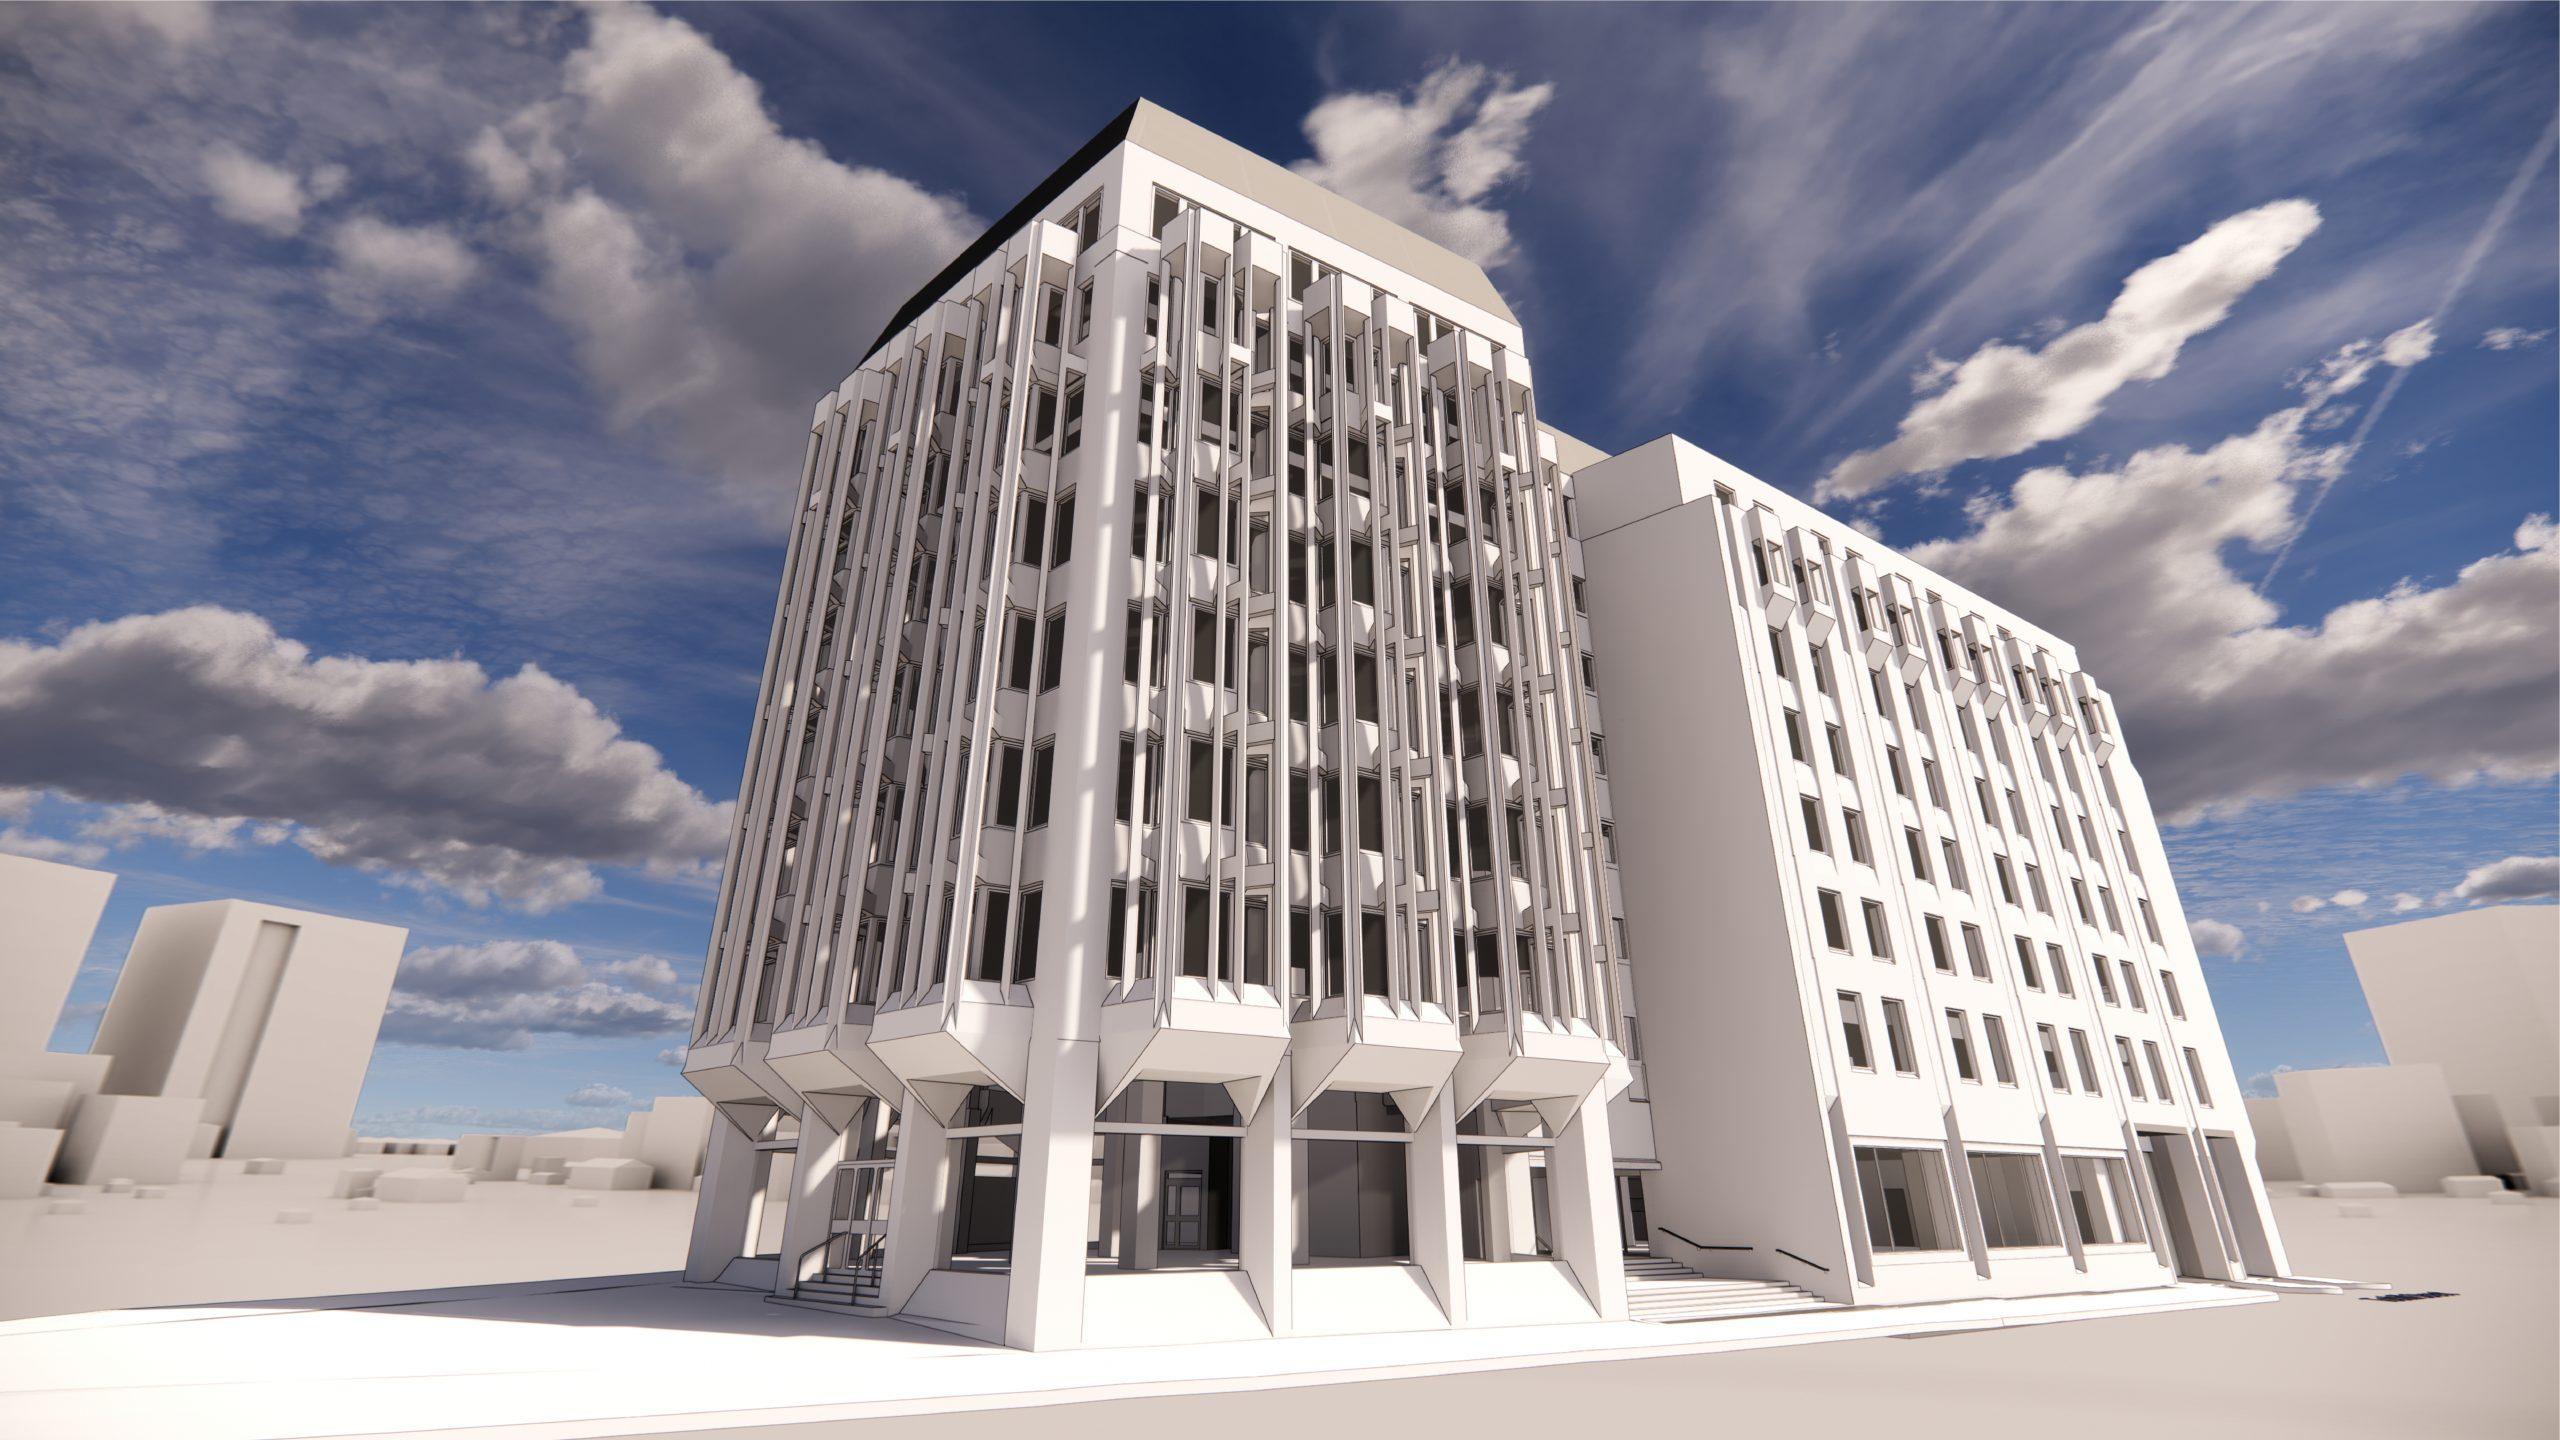 4 Victoria Street, 3D rendering, side view